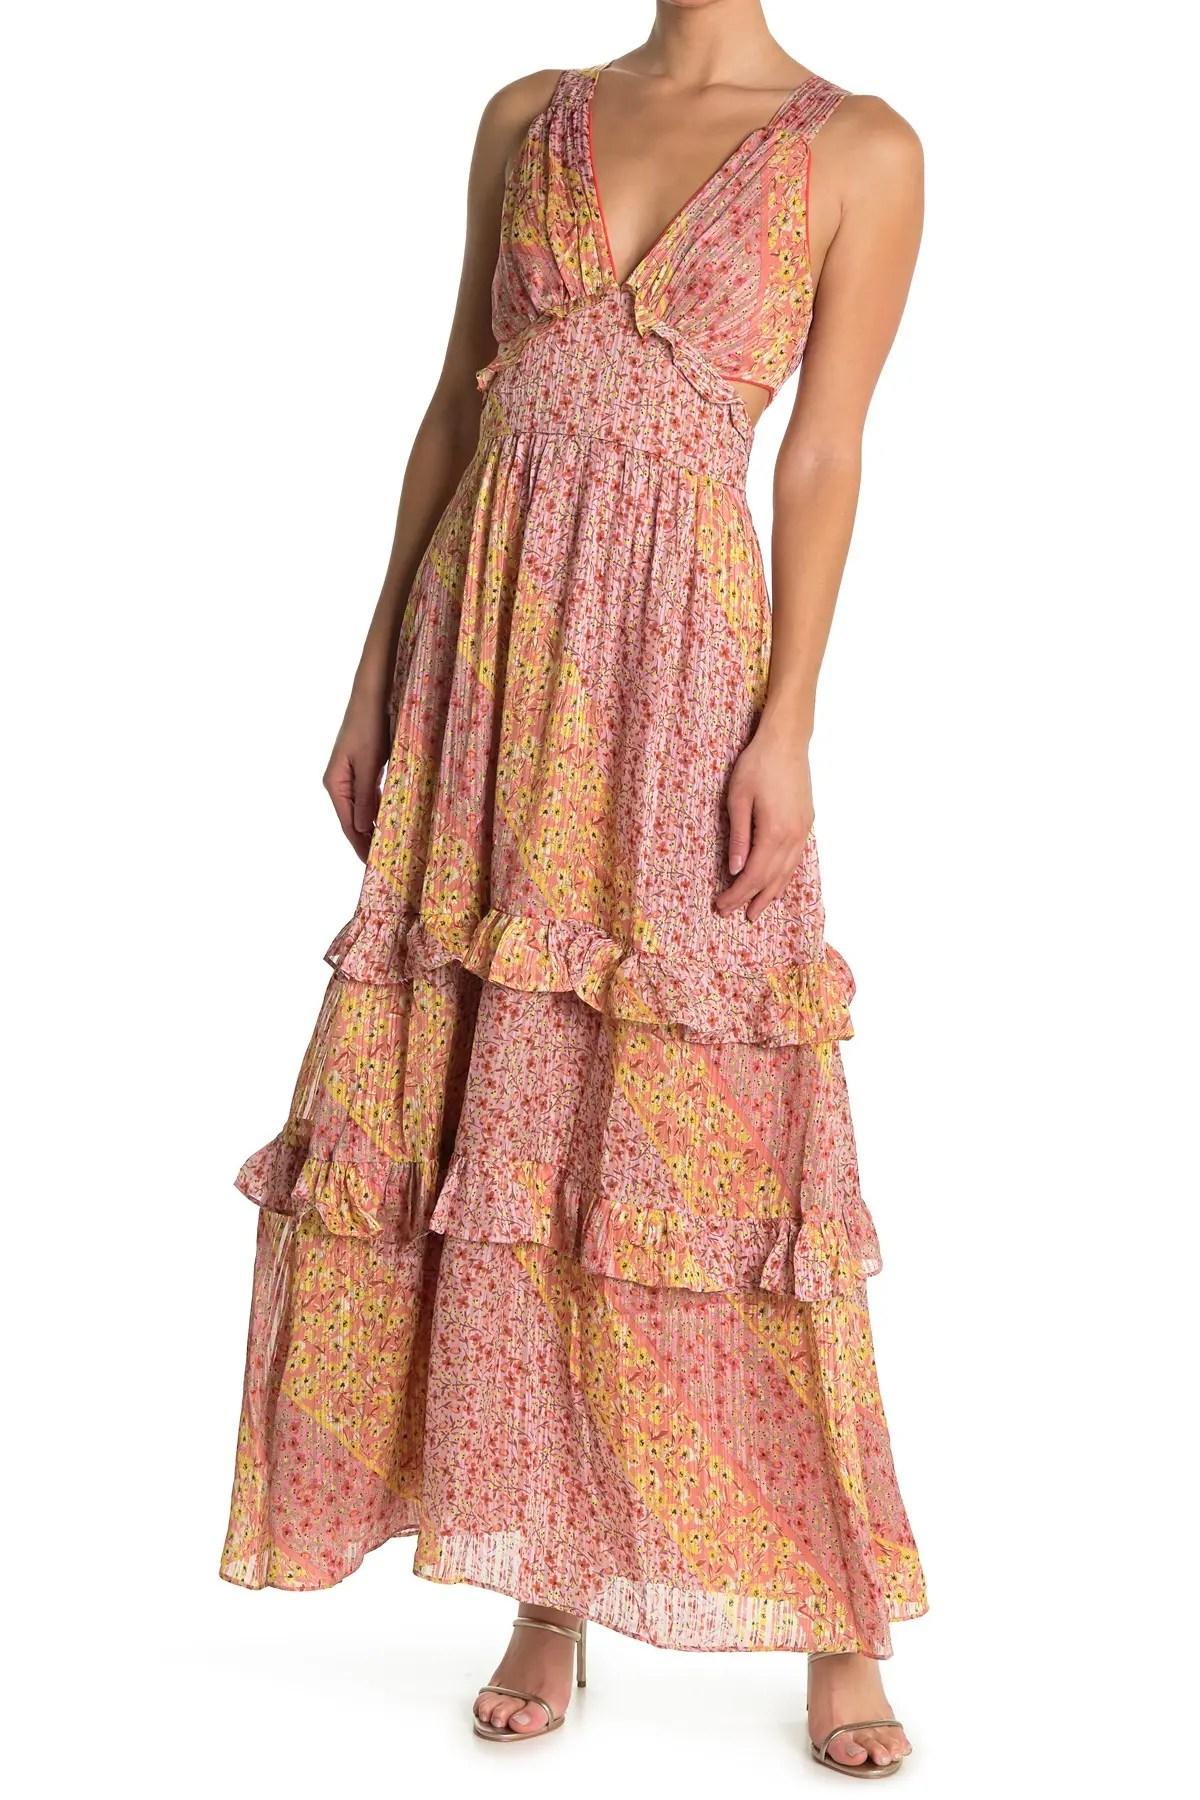 nordstrom rack maxi dress online